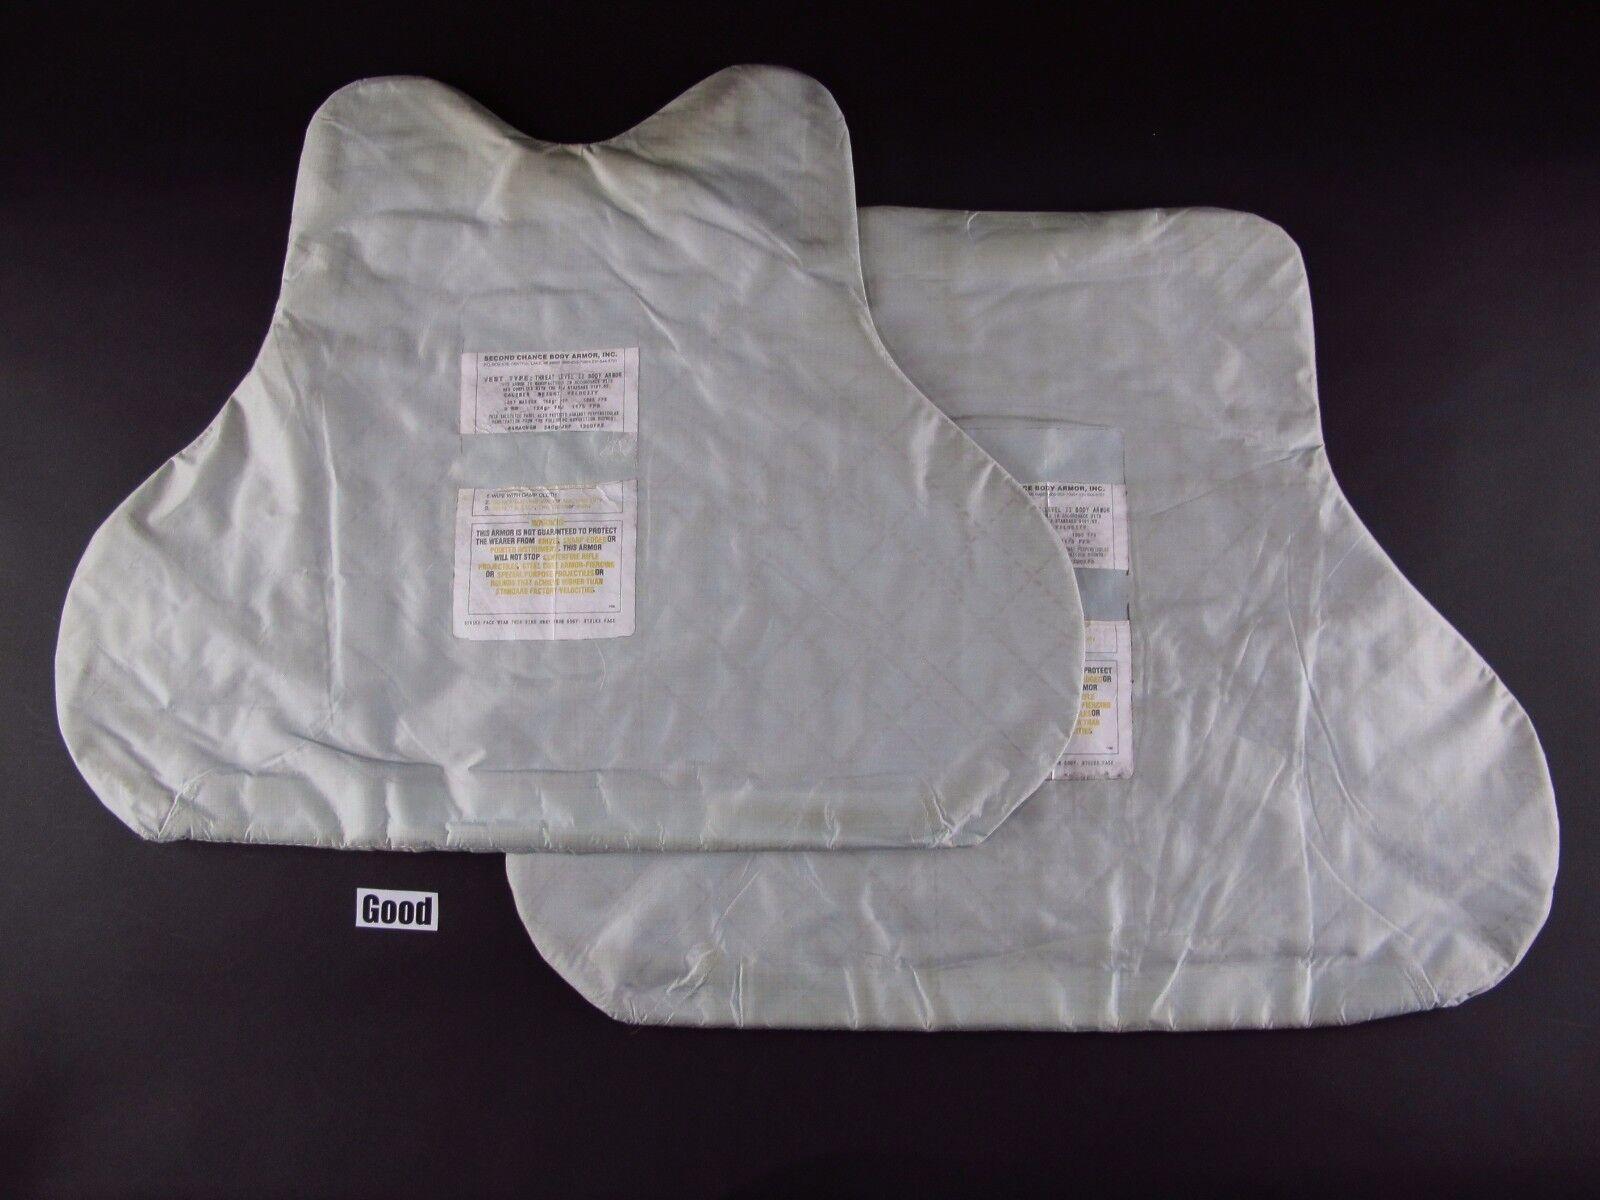 Female MED Body Armor  Bullet Proof Resistant Vest Ballistic panels Level 2 II GD  outlet